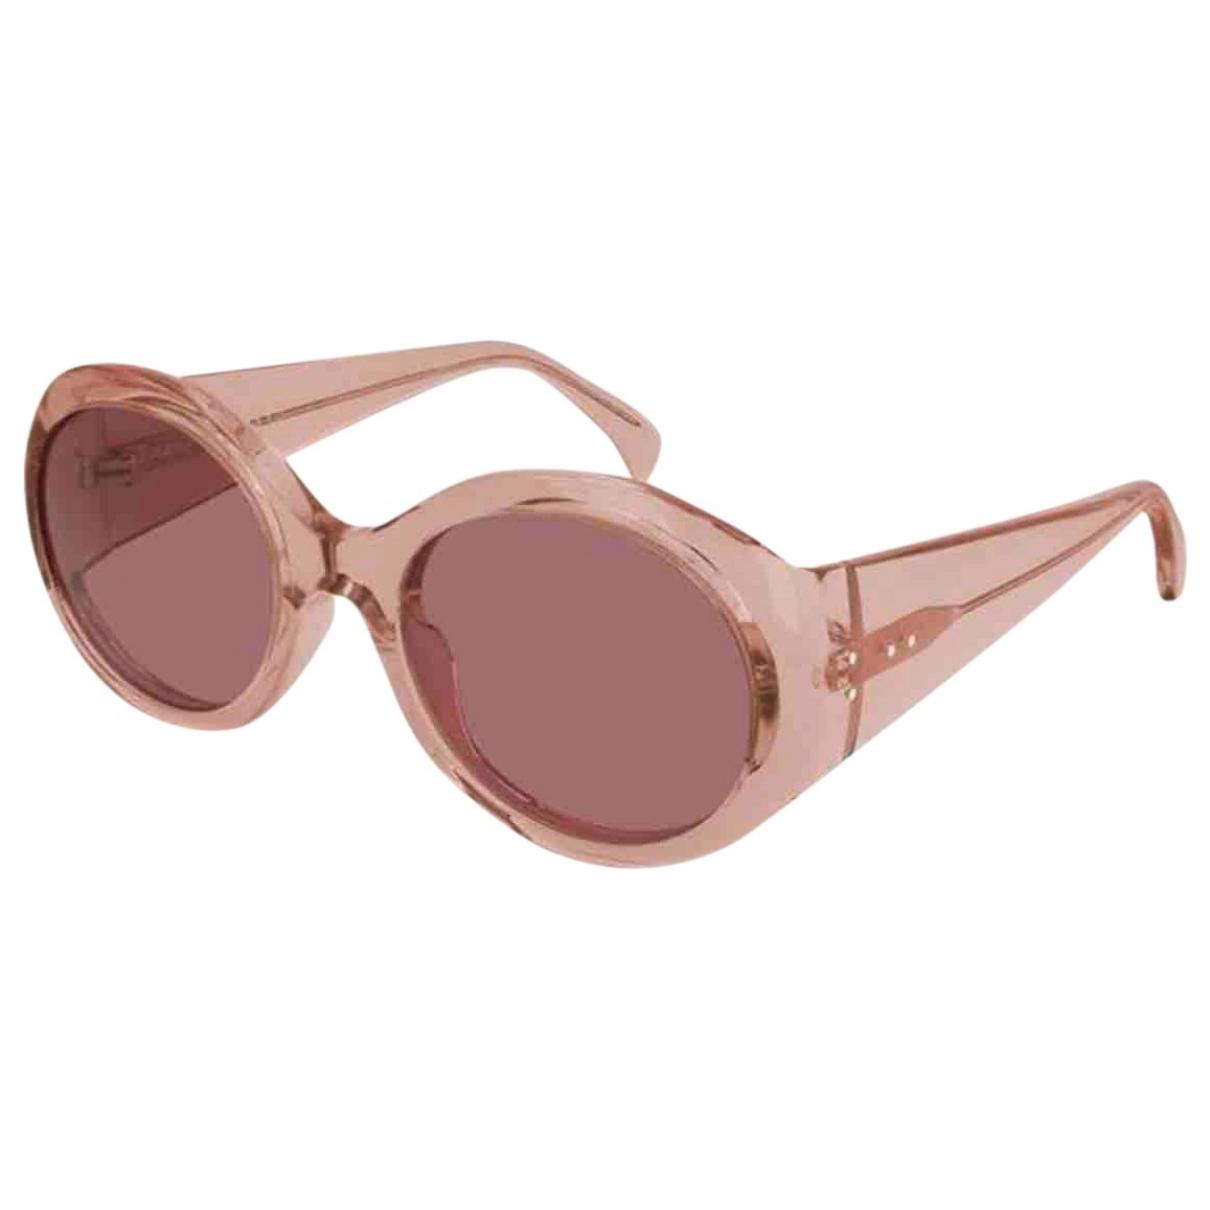 Alaïa \N Pink Sunglasses for Women \N